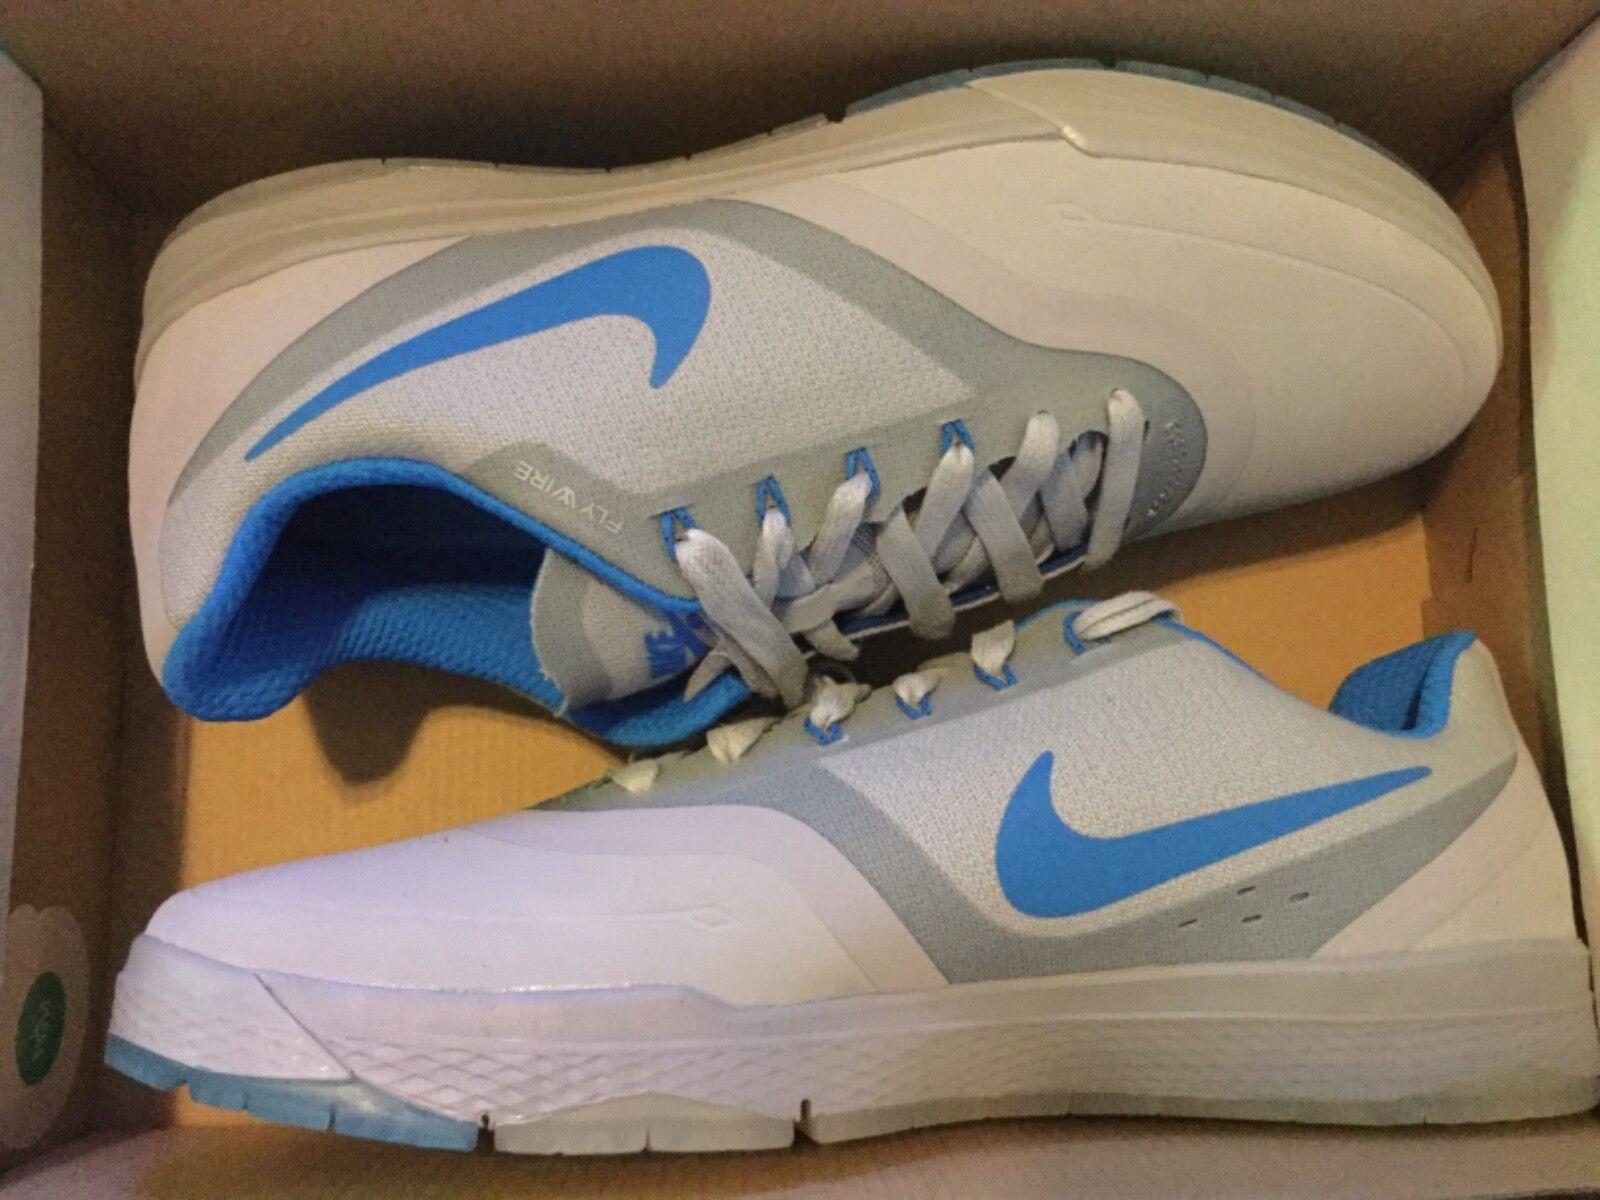 New Nike Paul Rodriguez 9 Elite T Skateboarding Shoes 833902-004 Sz 10.5 Casual wild